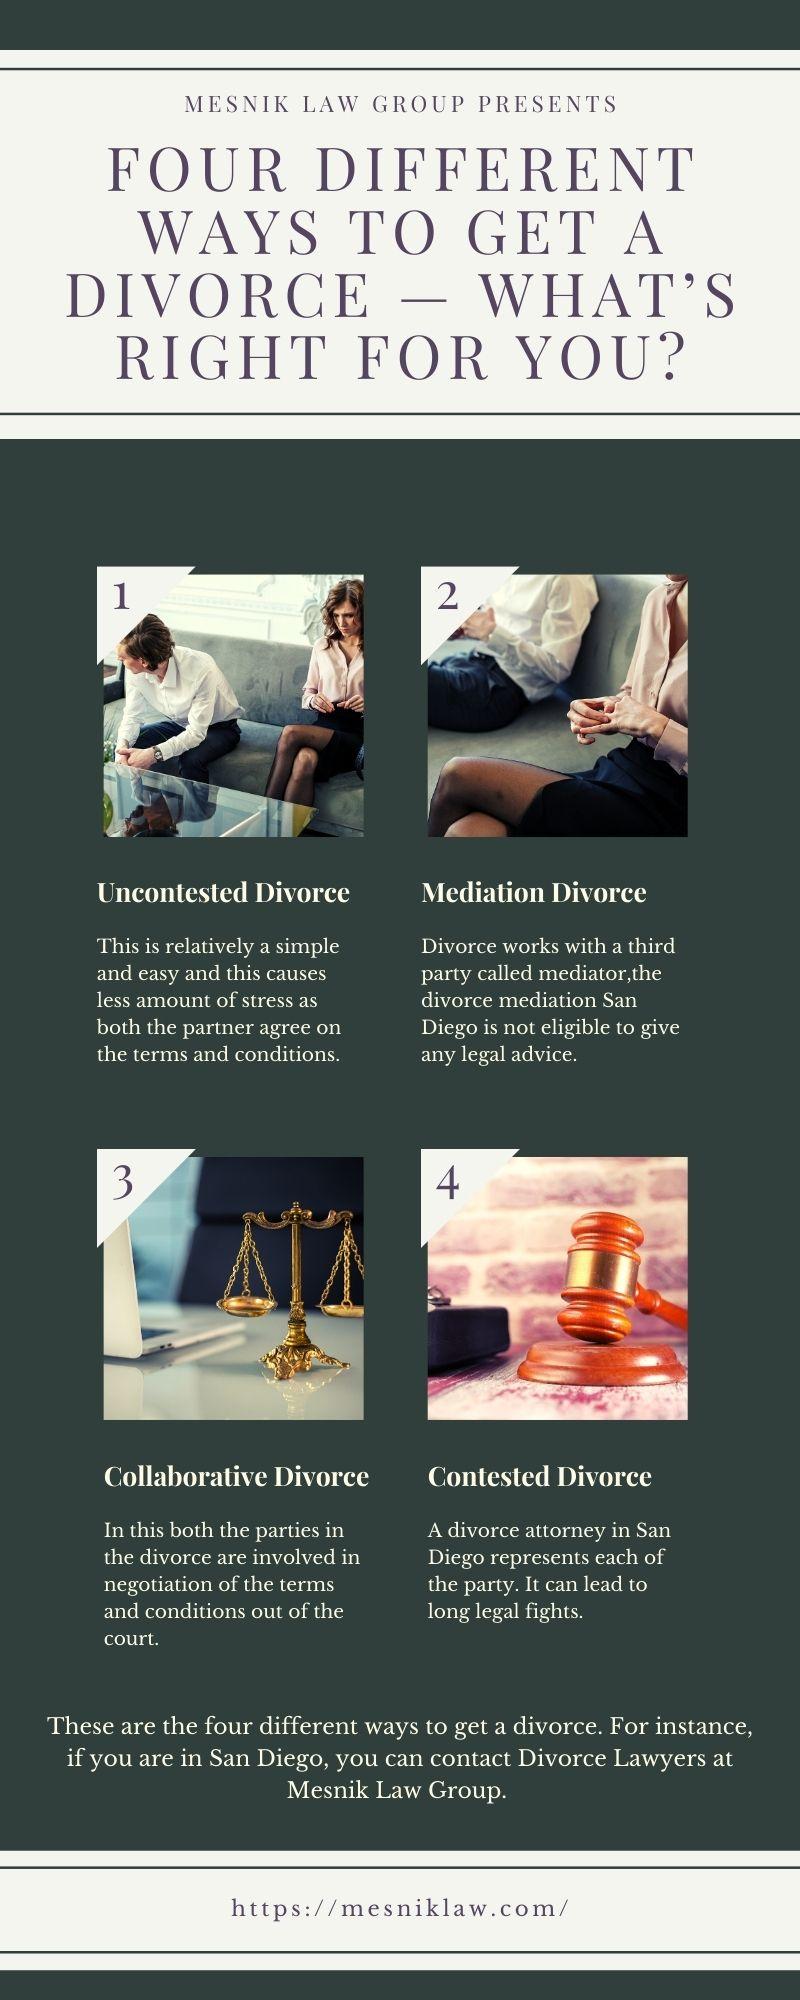 Four Different Ways to Get a Divorce